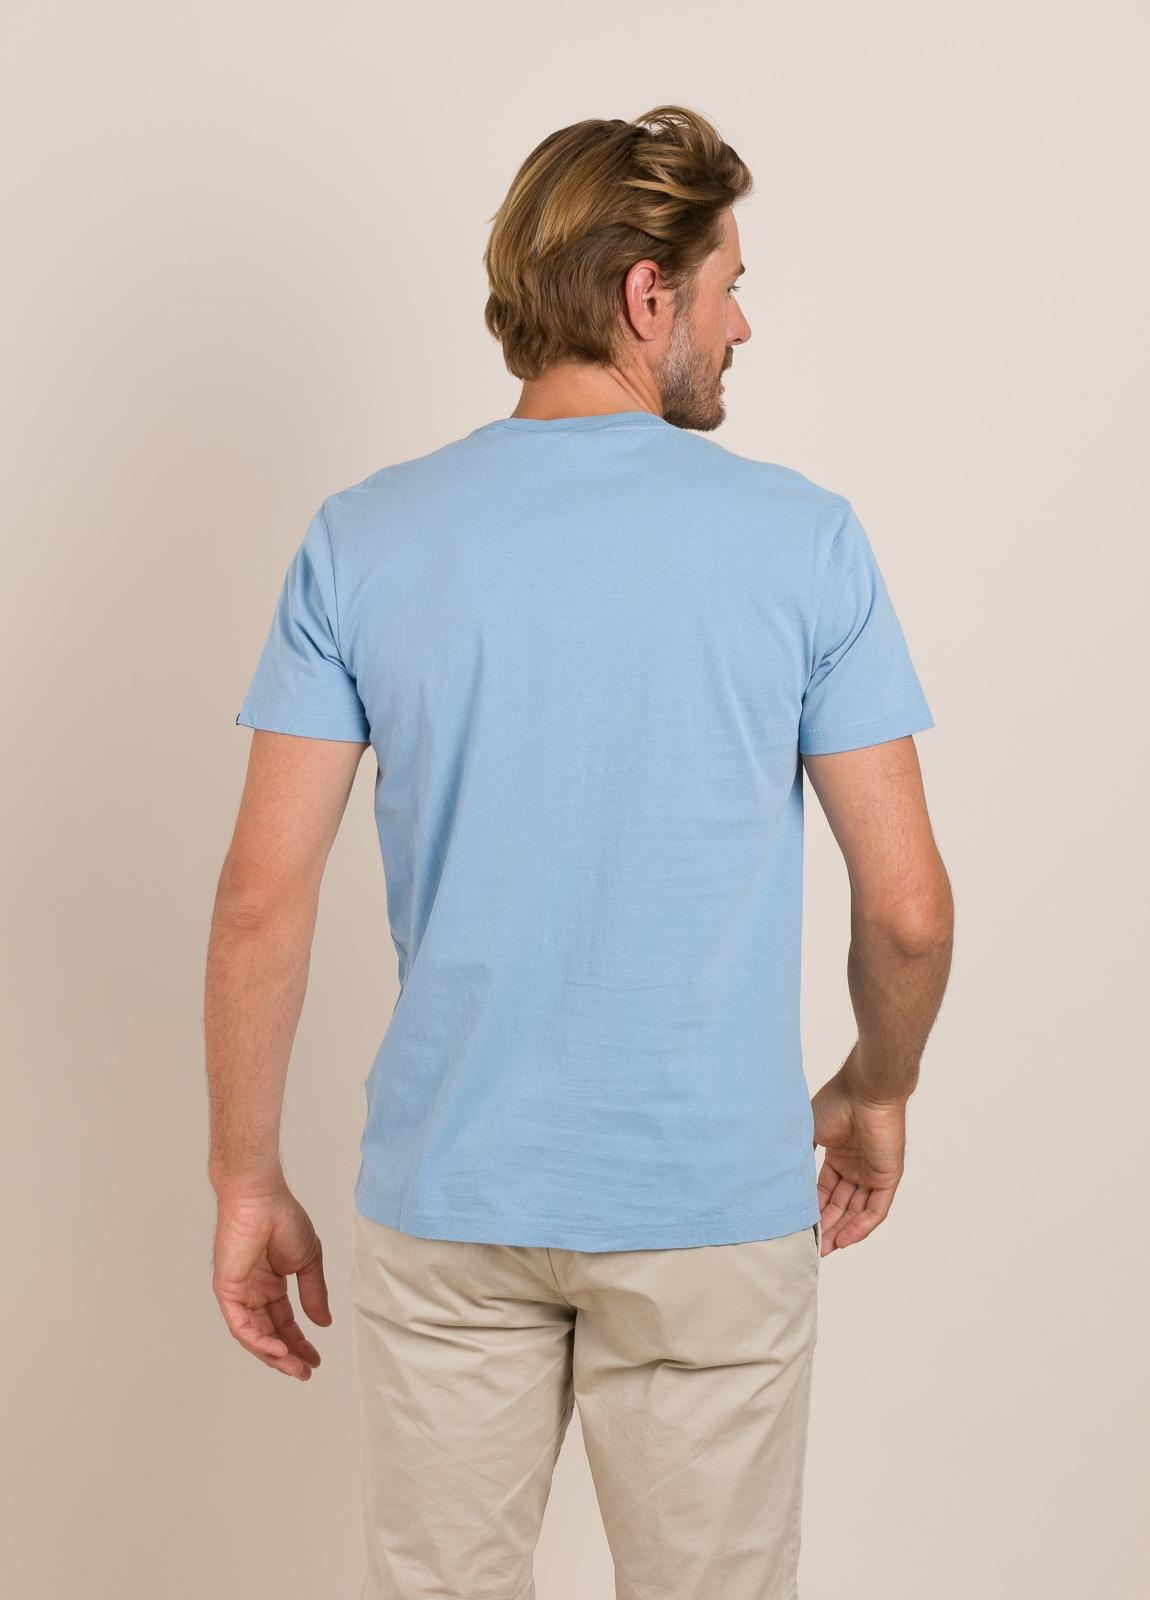 Camiseta DEUS celeste - Ítem1